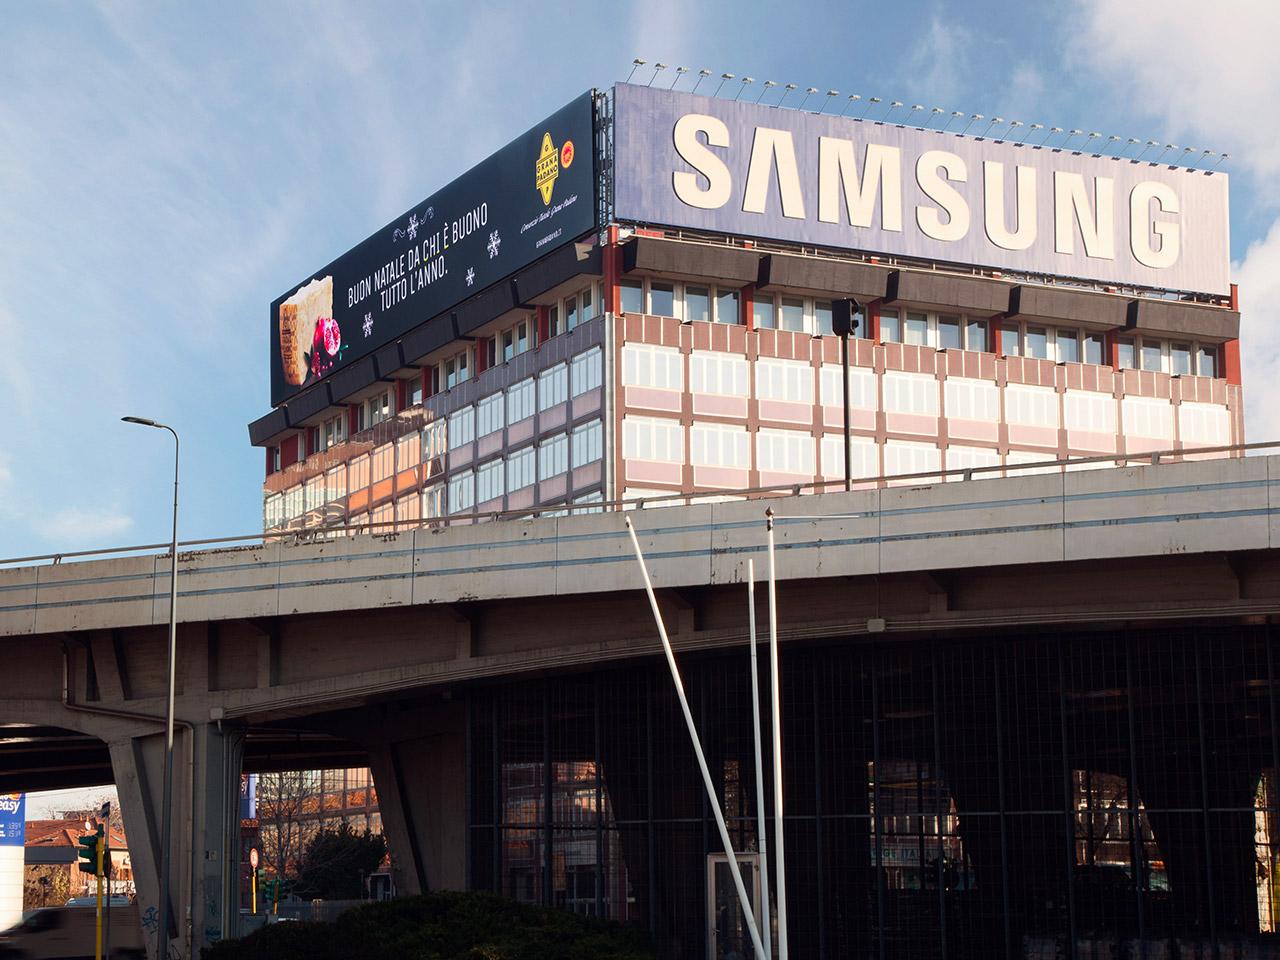 Maxi-billboard-maxischermo-led-su-tetto-giant-ledwall-1280x960-1